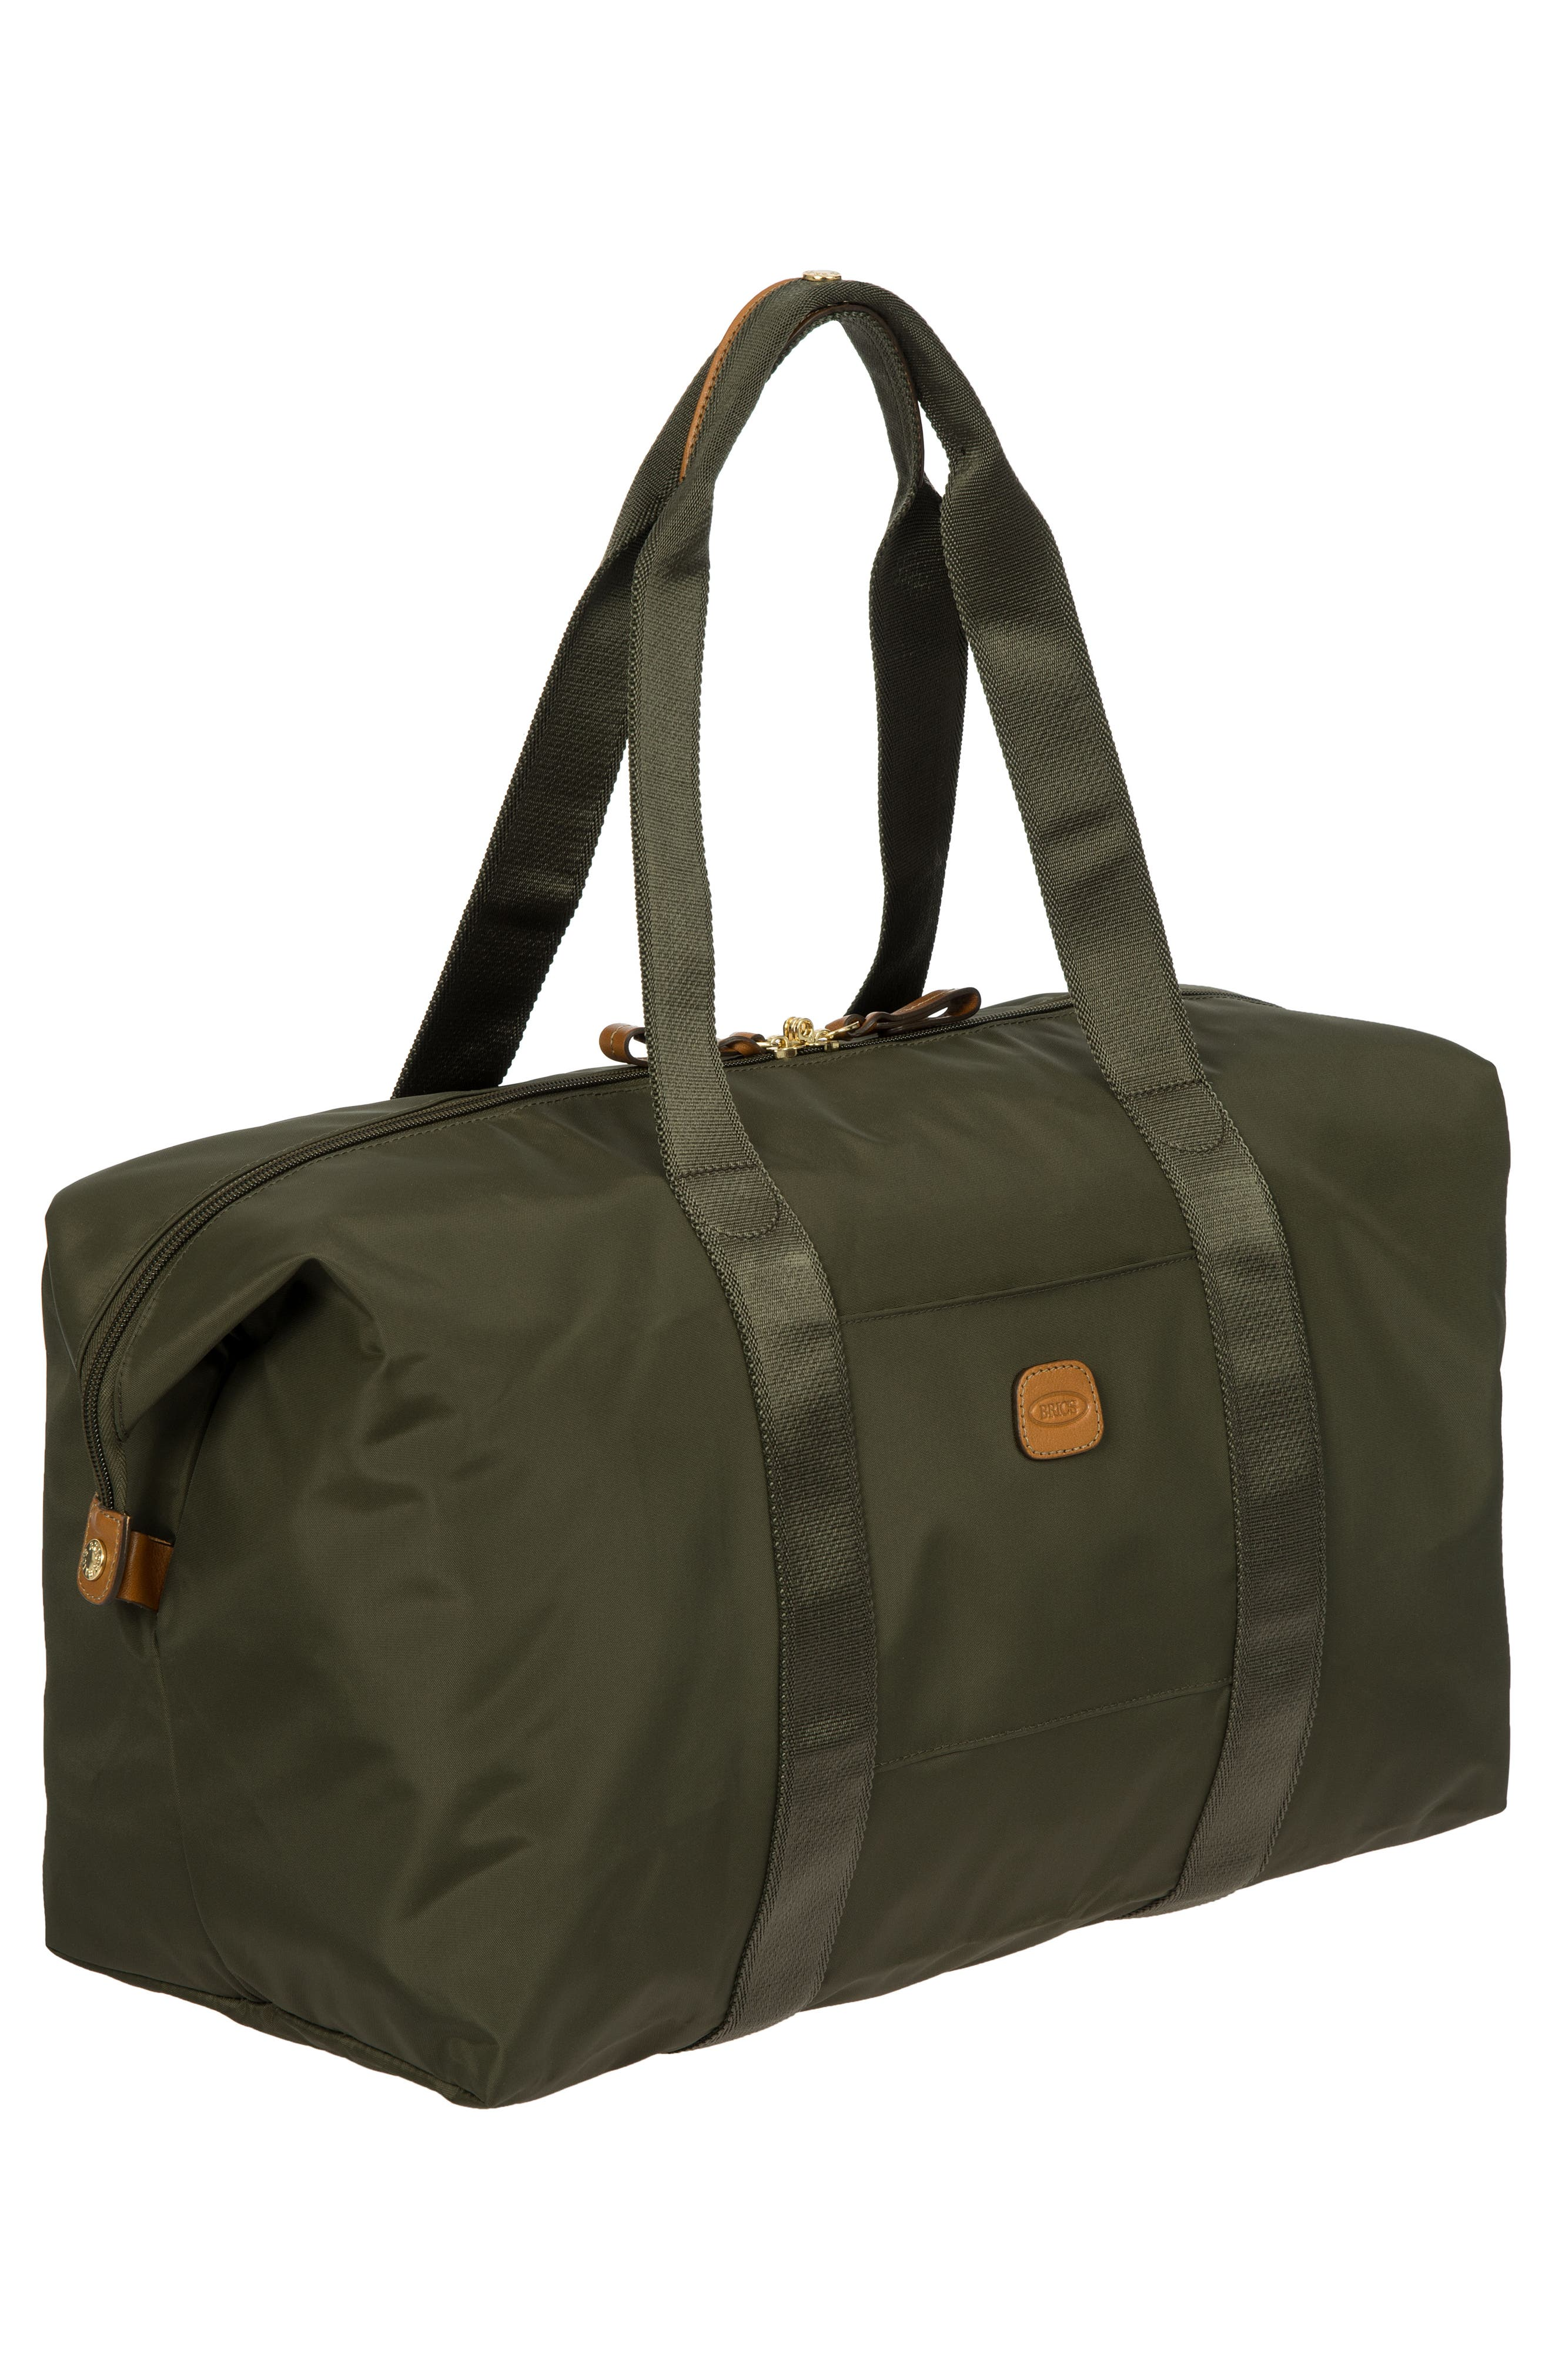 X-Bag 18-Inch Folding Duffel Bag,                             Alternate thumbnail 6, color,                             Olive